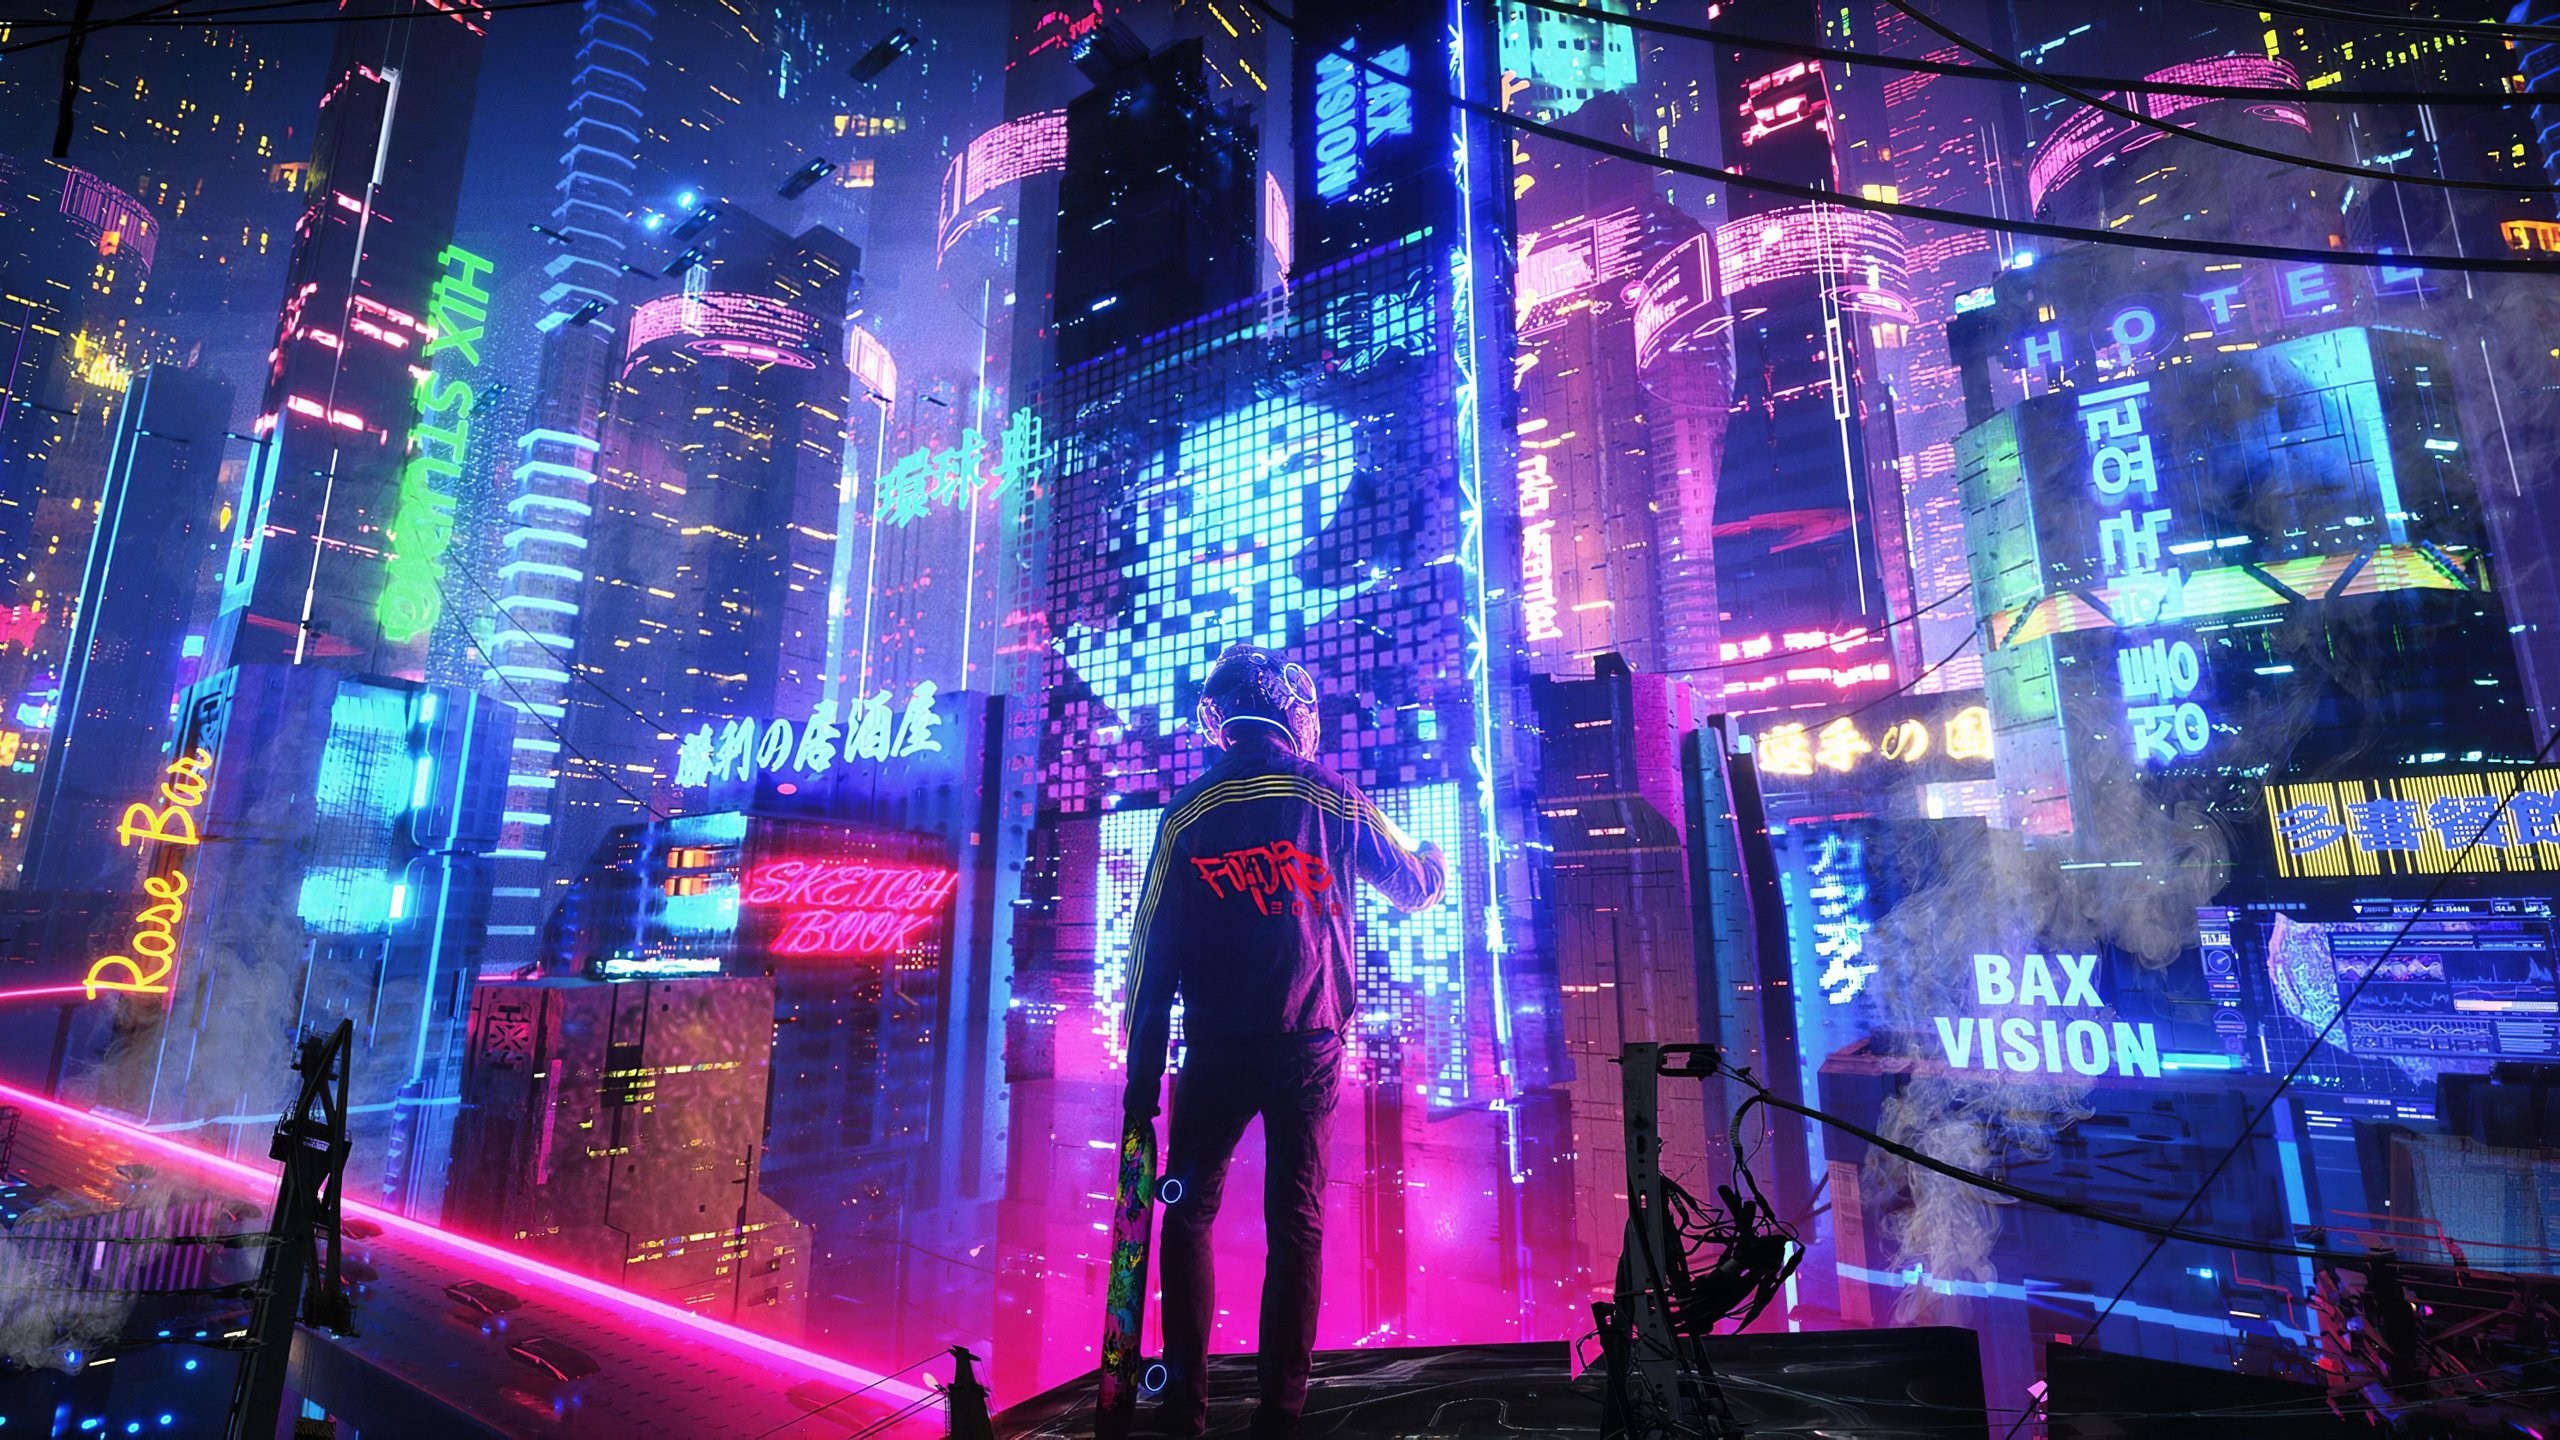 2560x1440 Neon City Pan 4k 1440P Resolution HD 4k ...